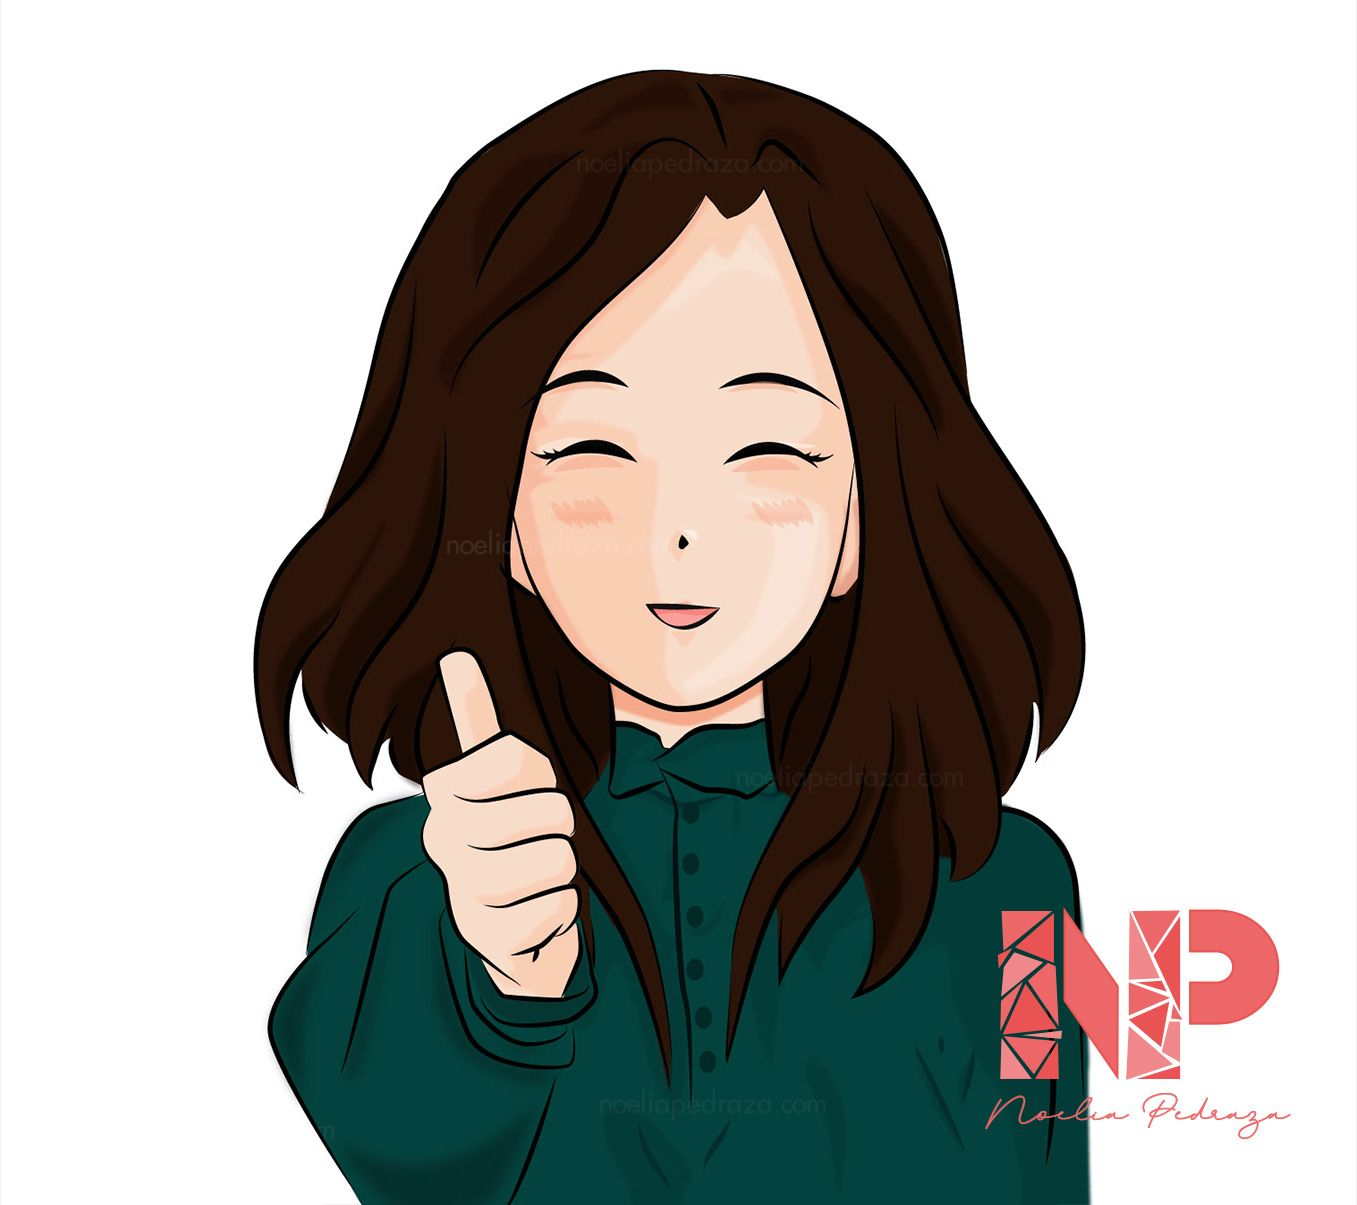 Ilustración chica sonriendo Anime